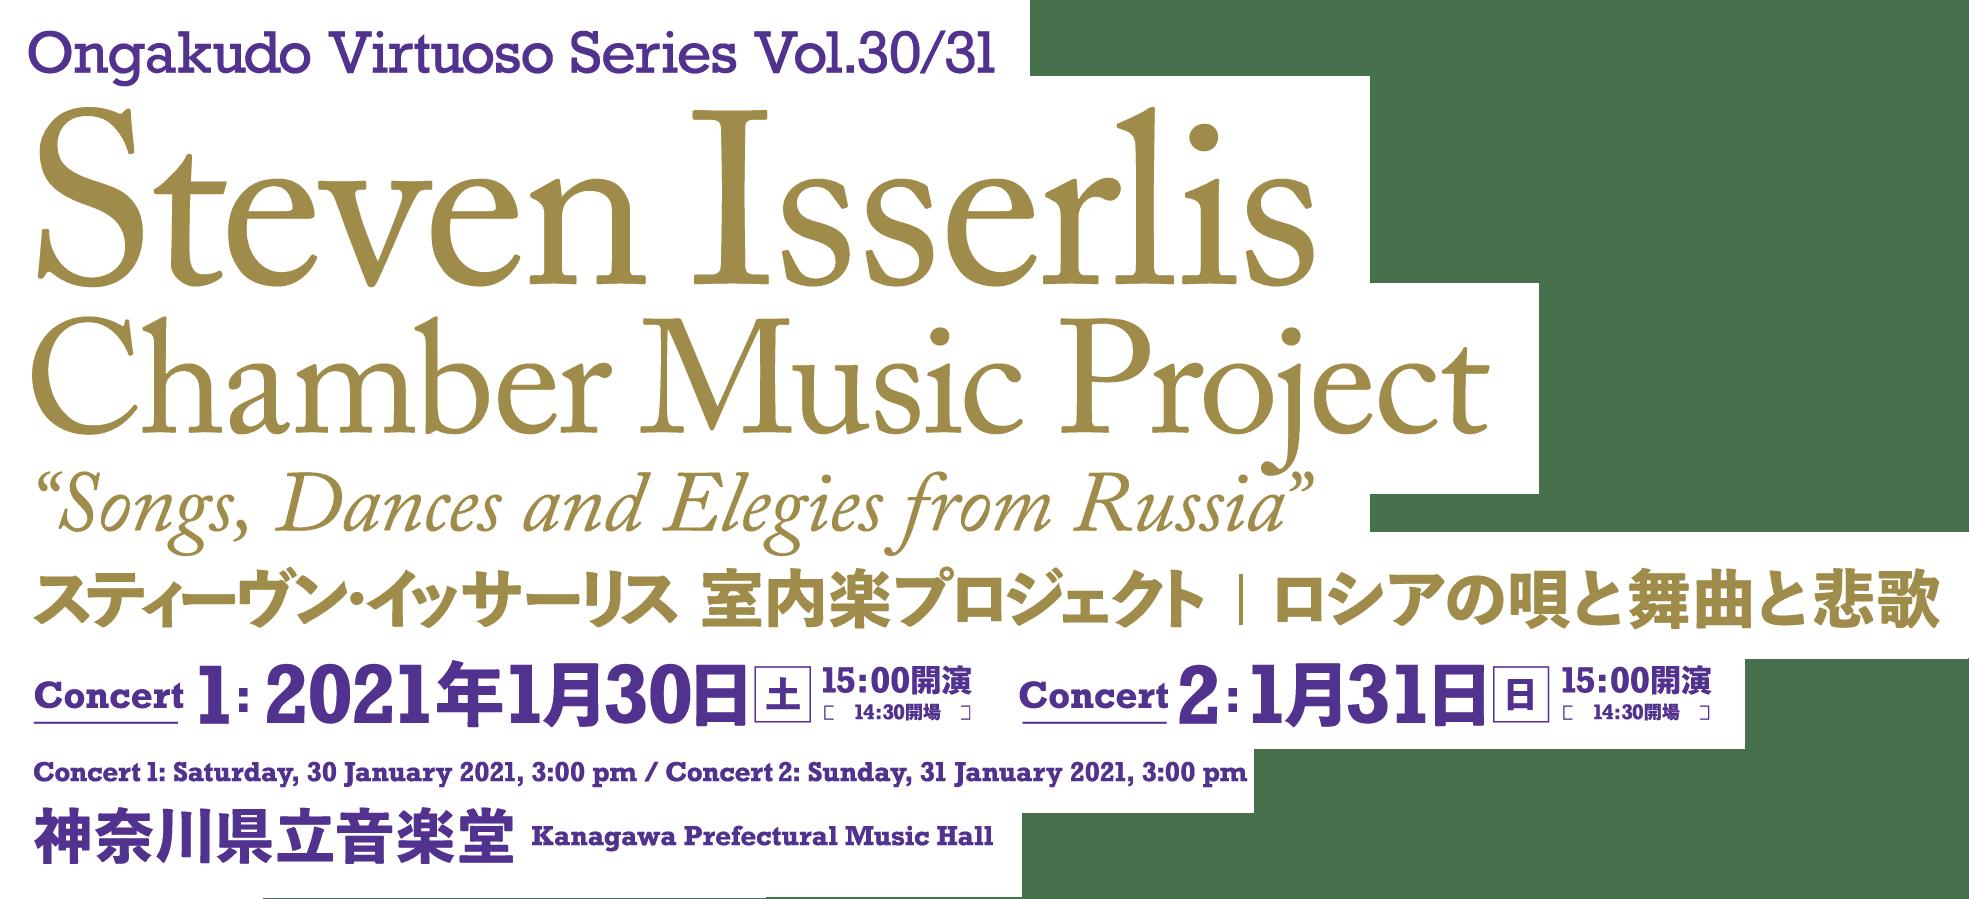 Ongakudo Virtuoso Series Vol.30/31 Steven Isserlis